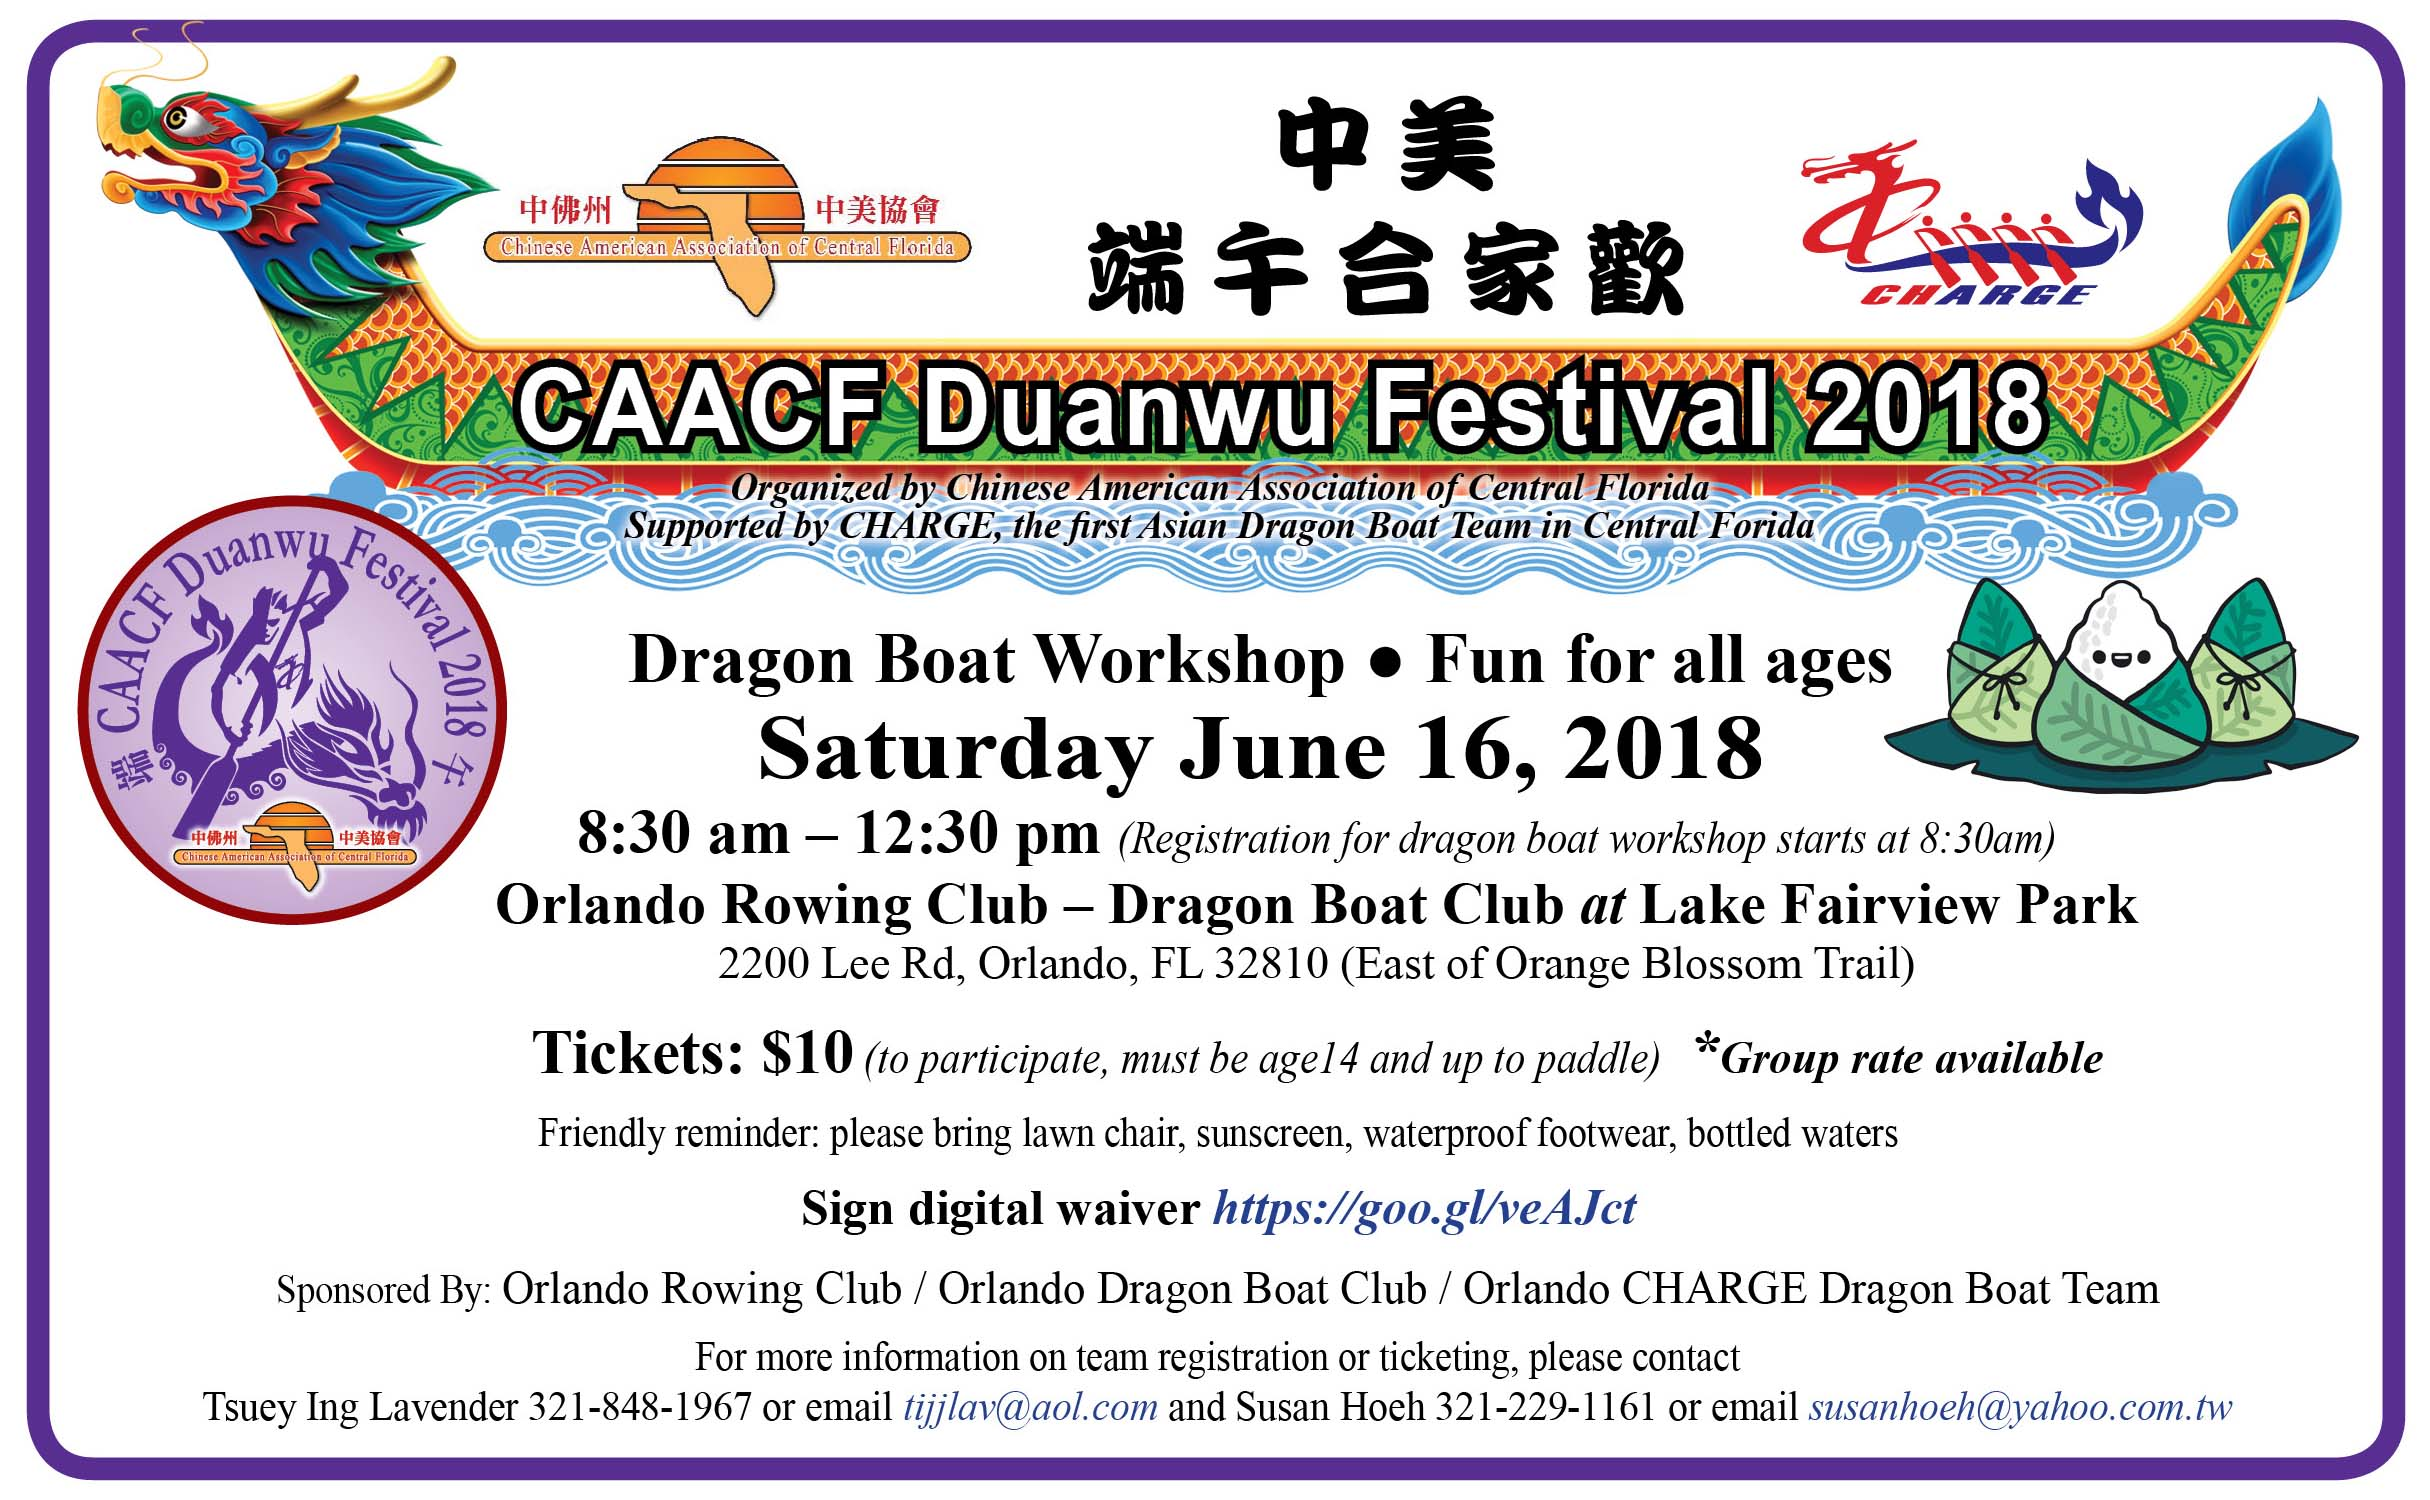 CAACF Duanwu Festival